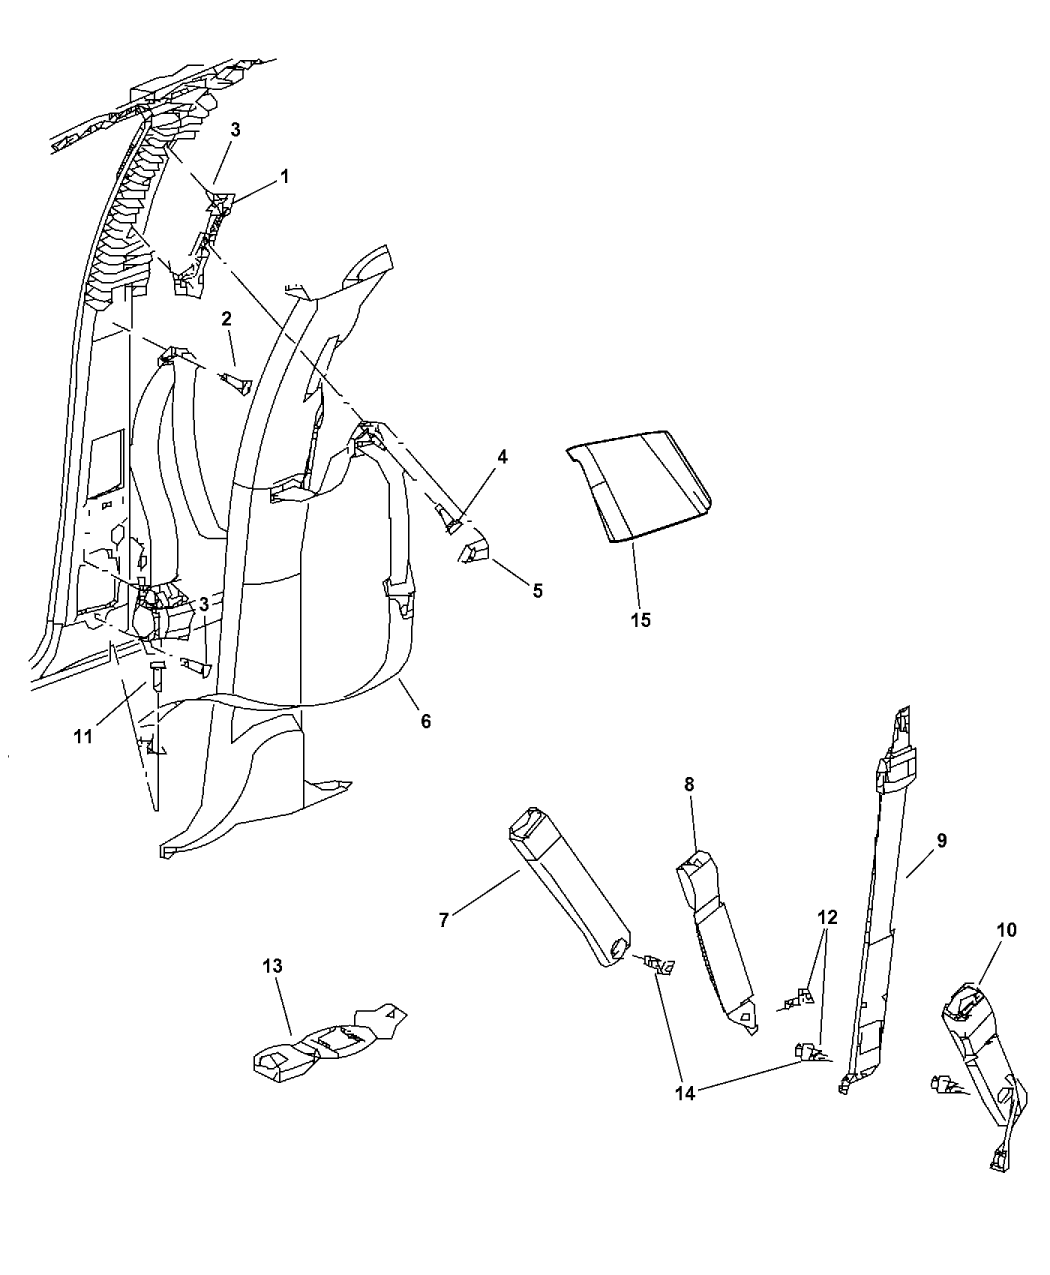 Rigid Seat Belt Extender for 2001 Pontiac Sunfire Front Seats E4 Safe